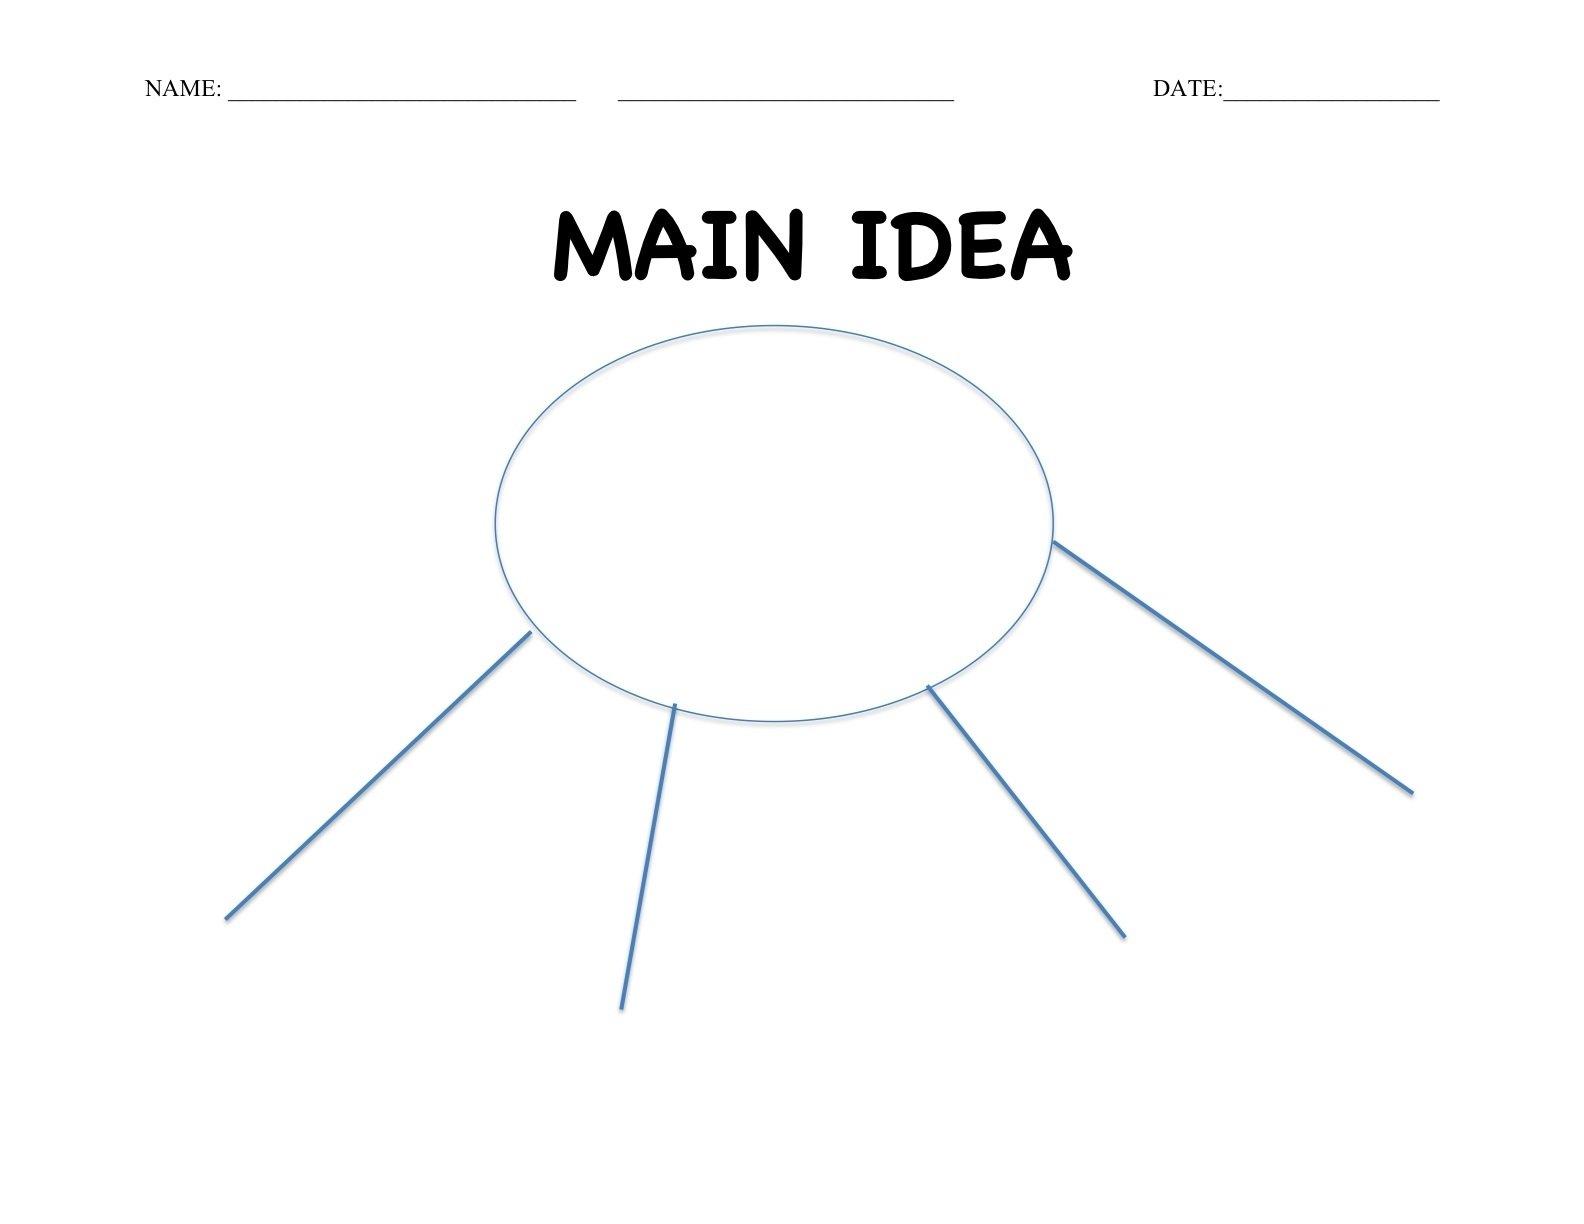 10 Best Graphic Organizer For Main Idea free first grade materials simple main idea graphic organizer 2020